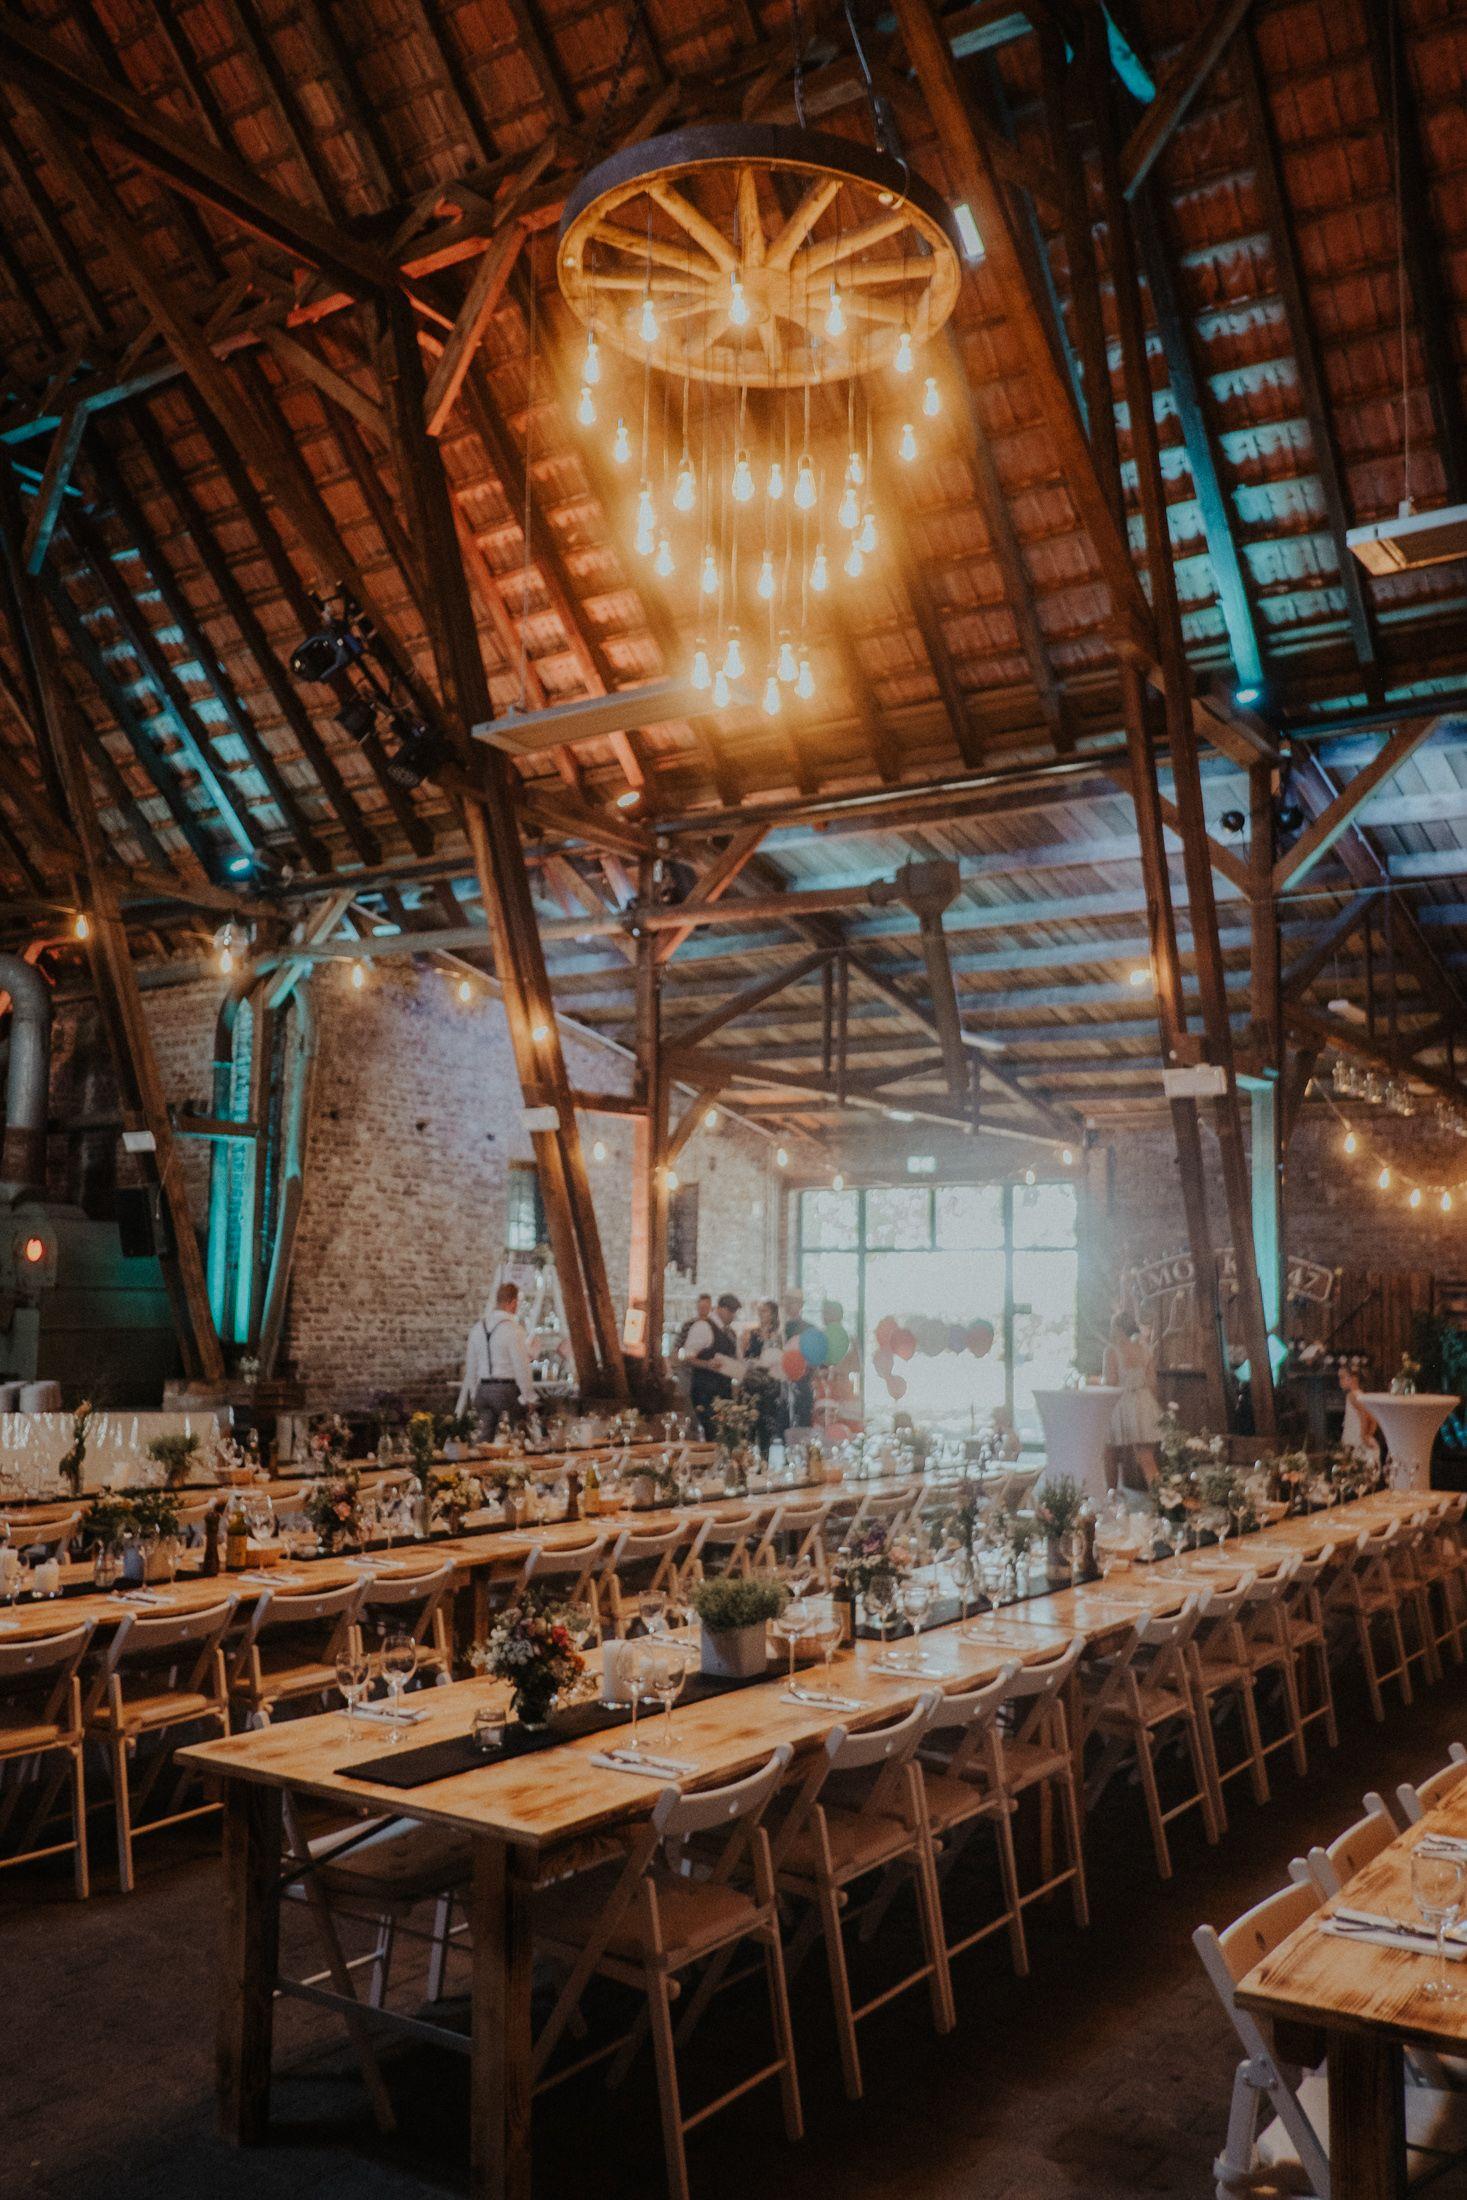 Hochzeitslocations Dortmund Parkhotel Wittekindshof